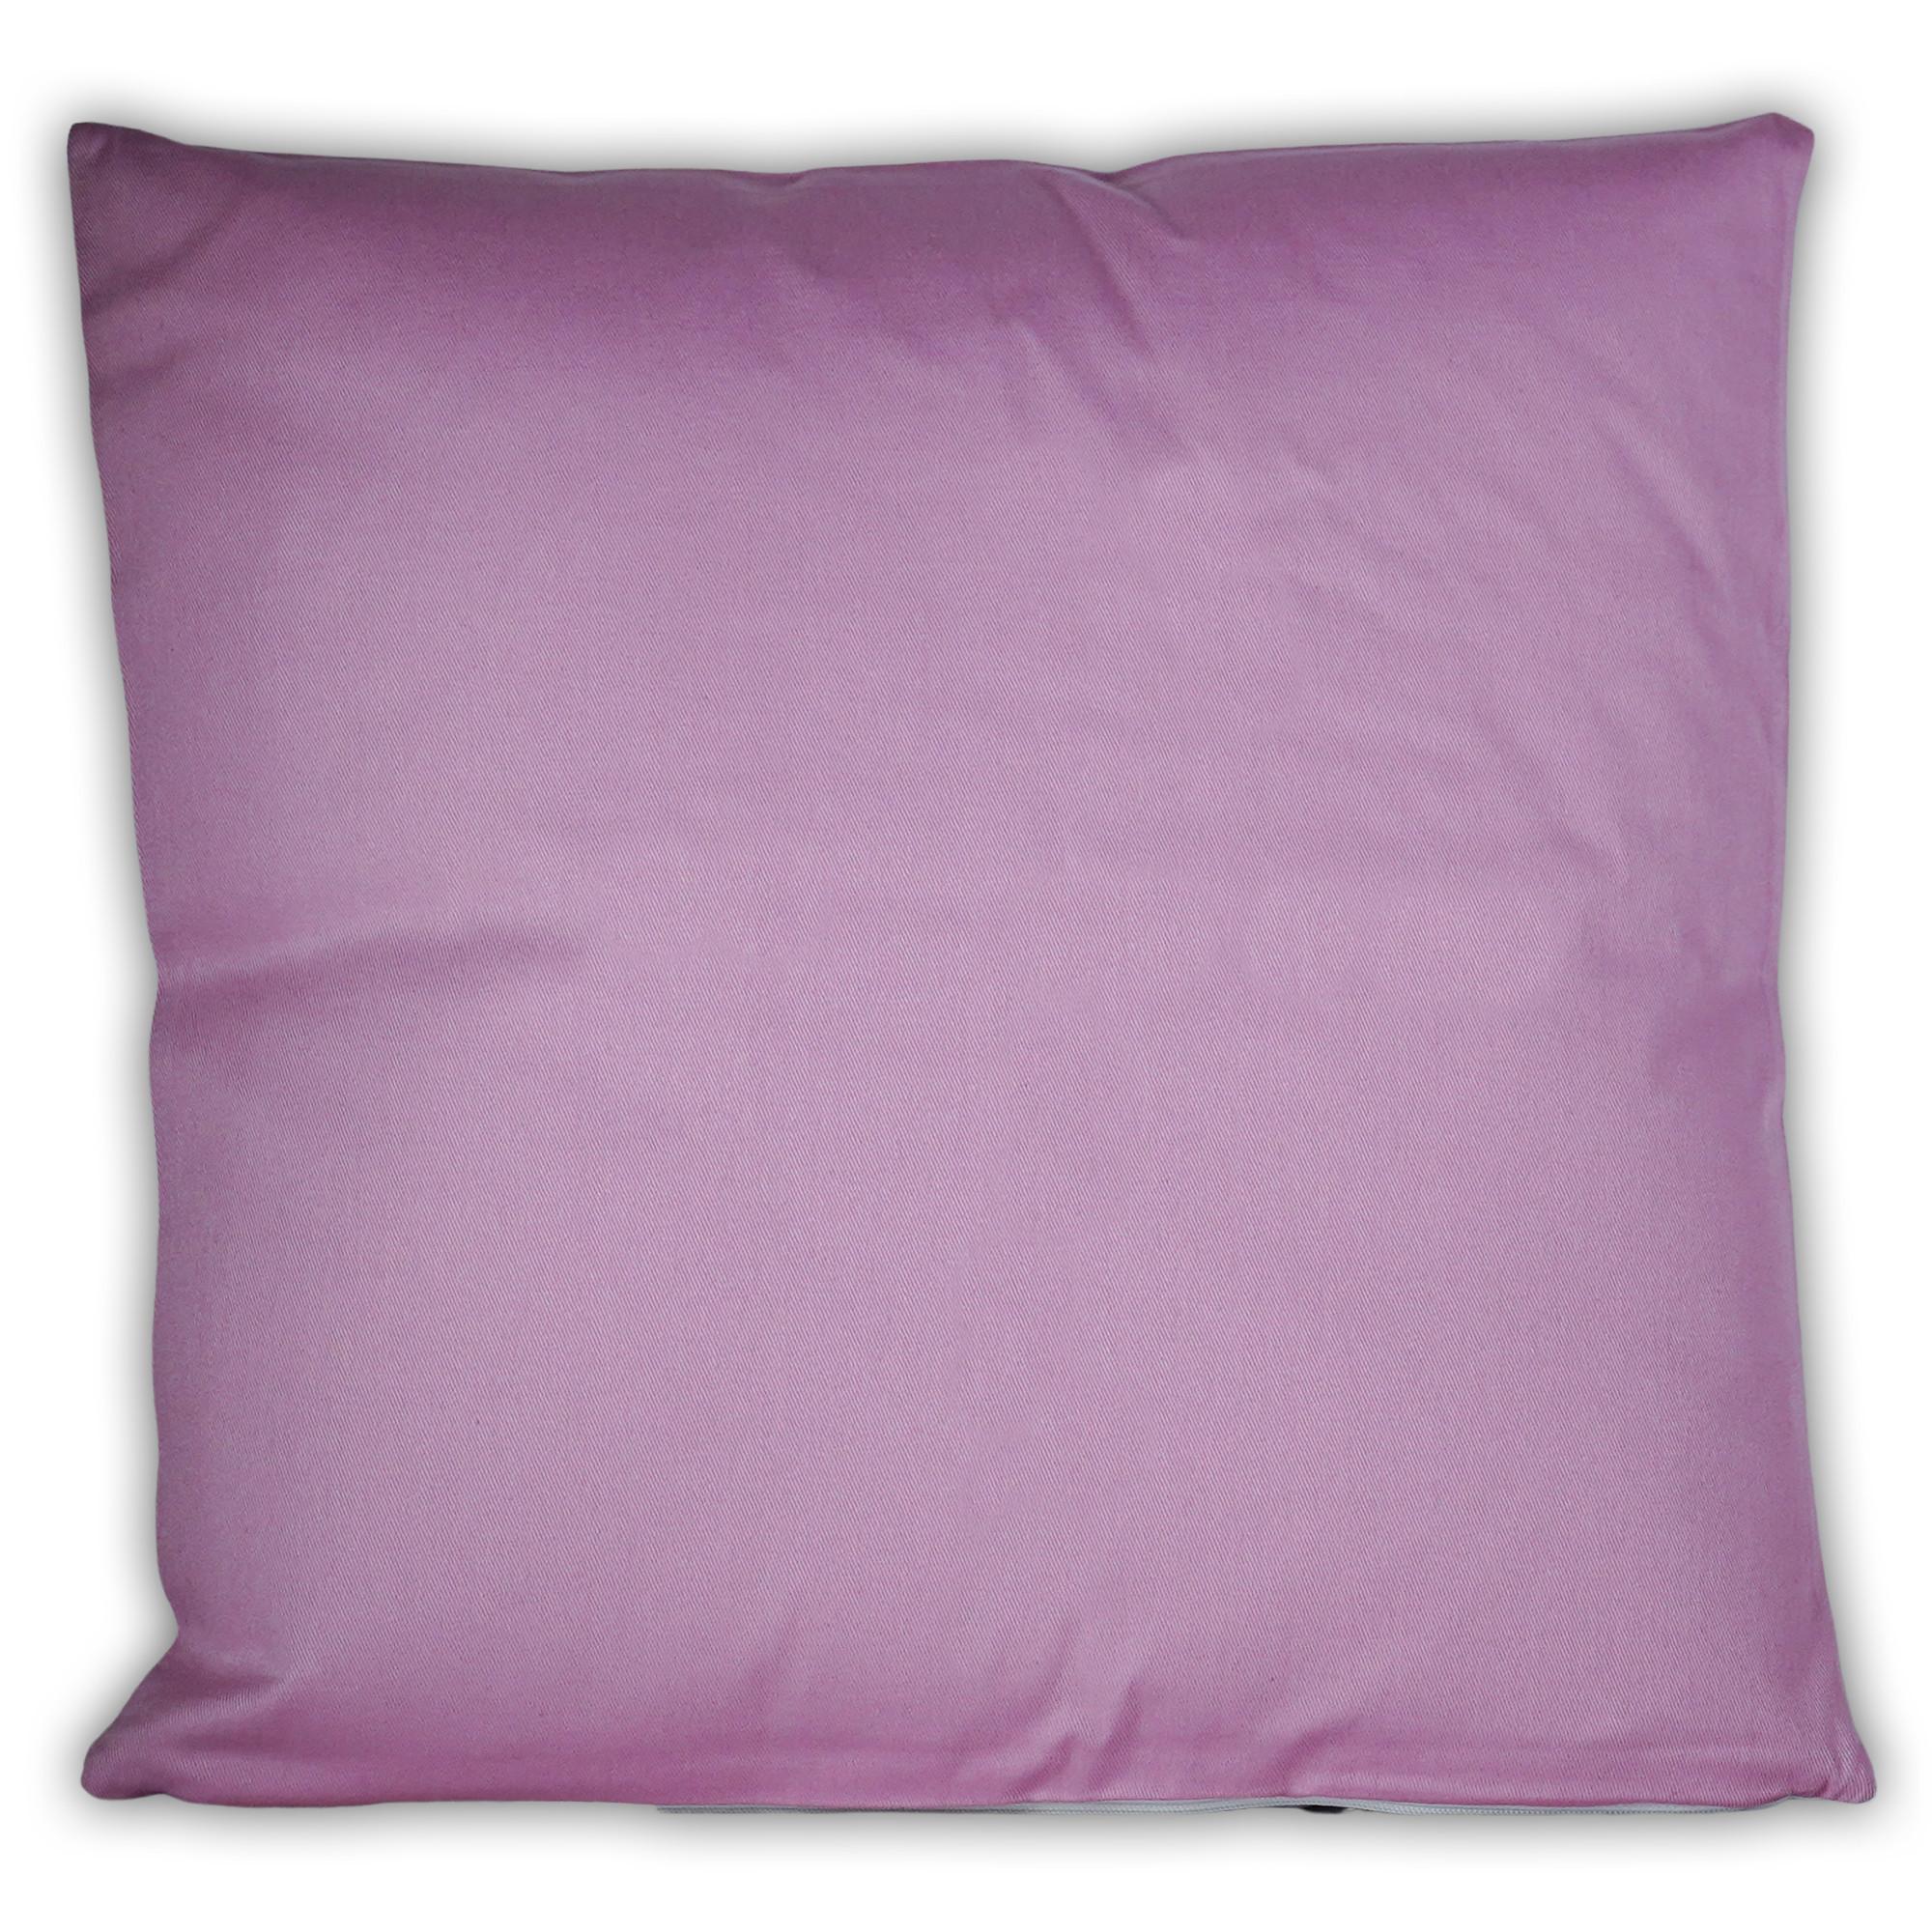 Fotokissen quadratisch zweifarbig rosa